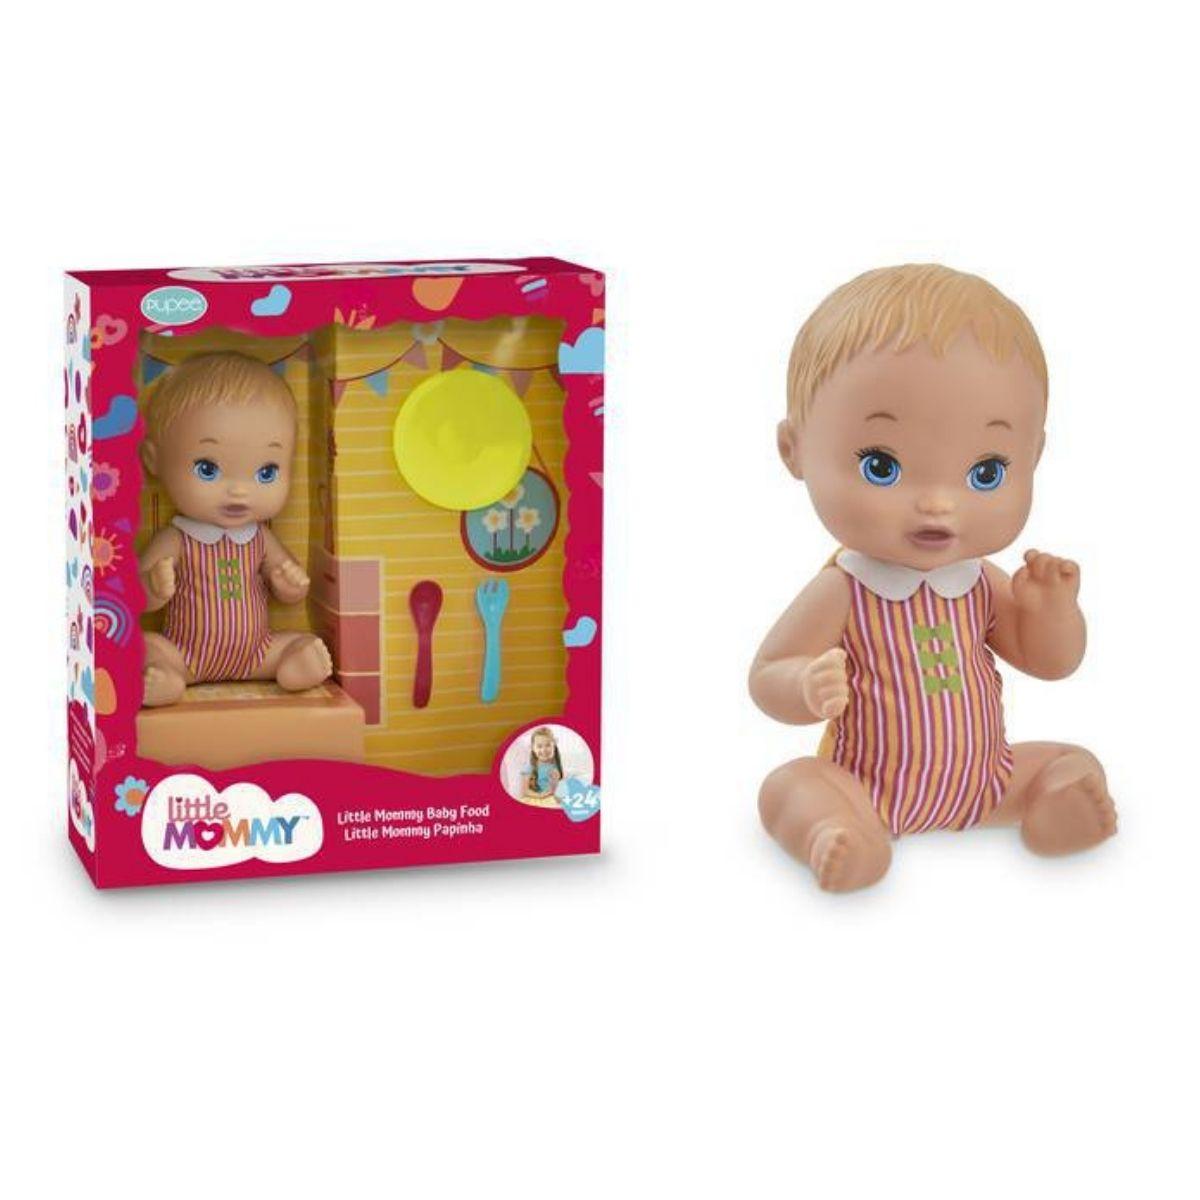 Boneca Little Mommy Papinha Com Acessorios 1026 Pupee